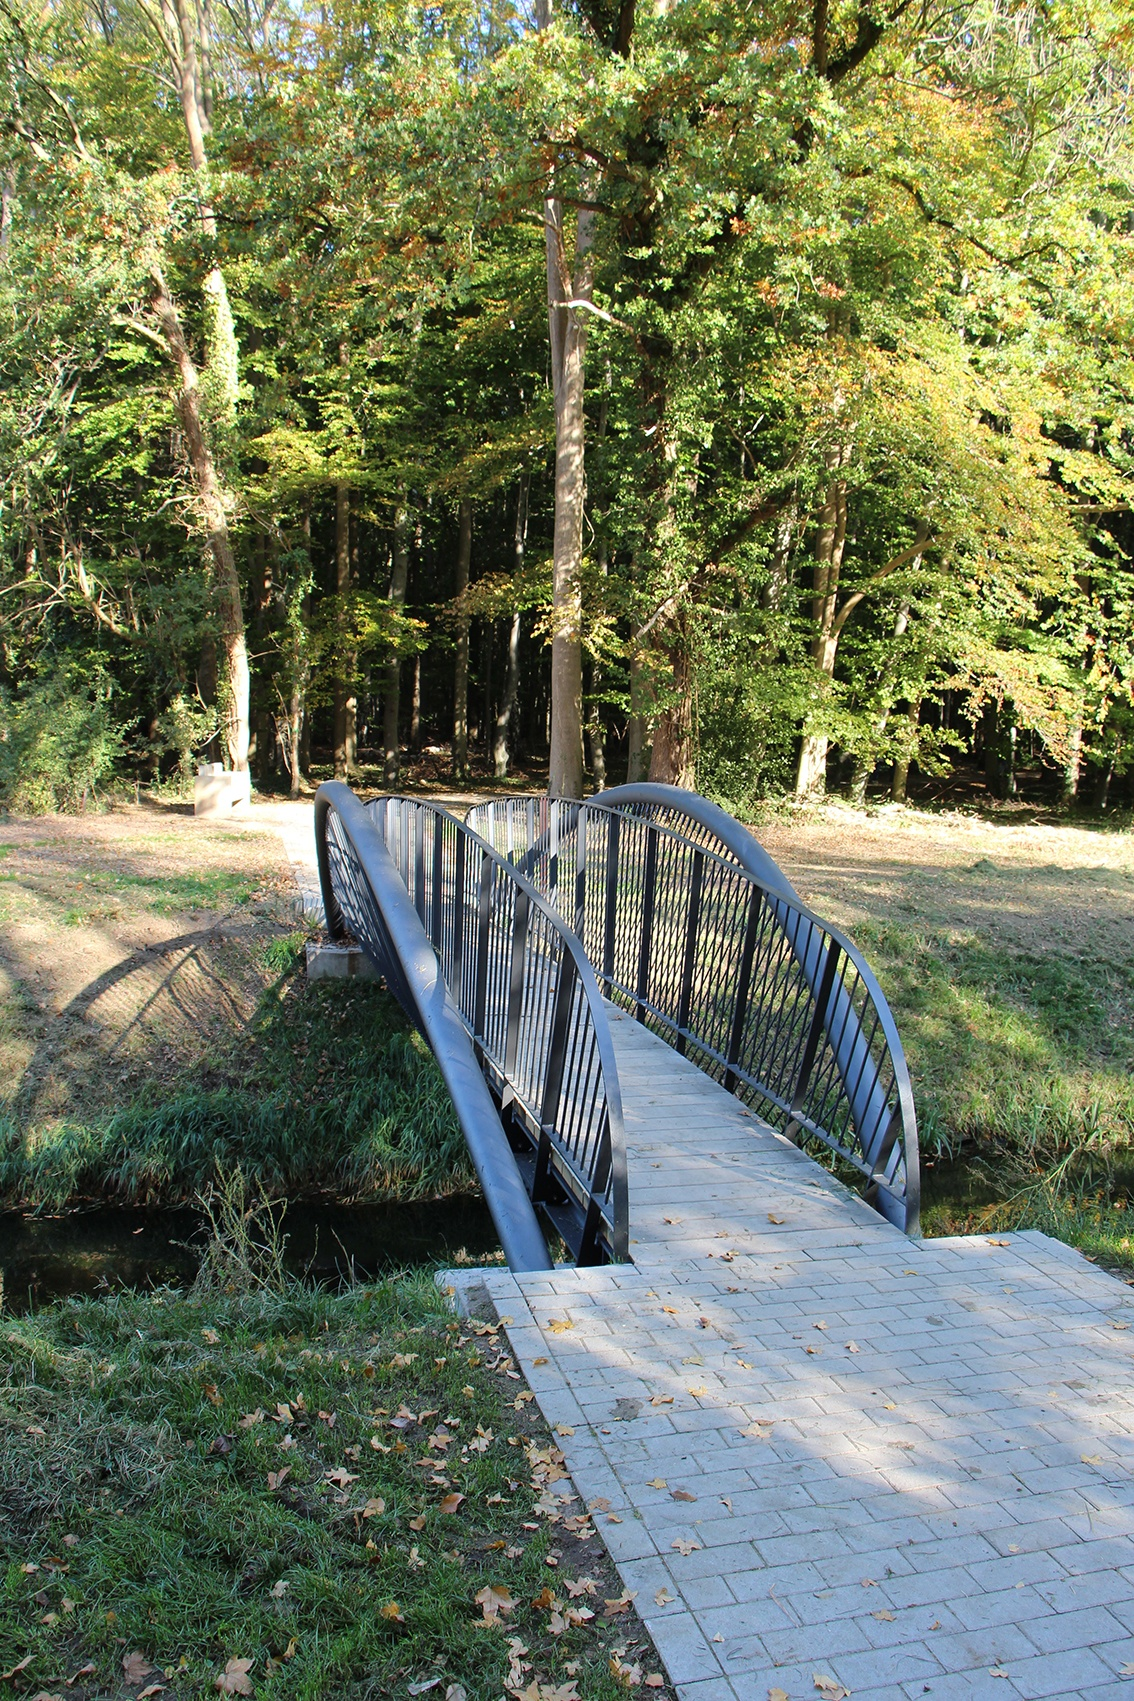 Verschiedene Brückenkonstruktionen am Weg